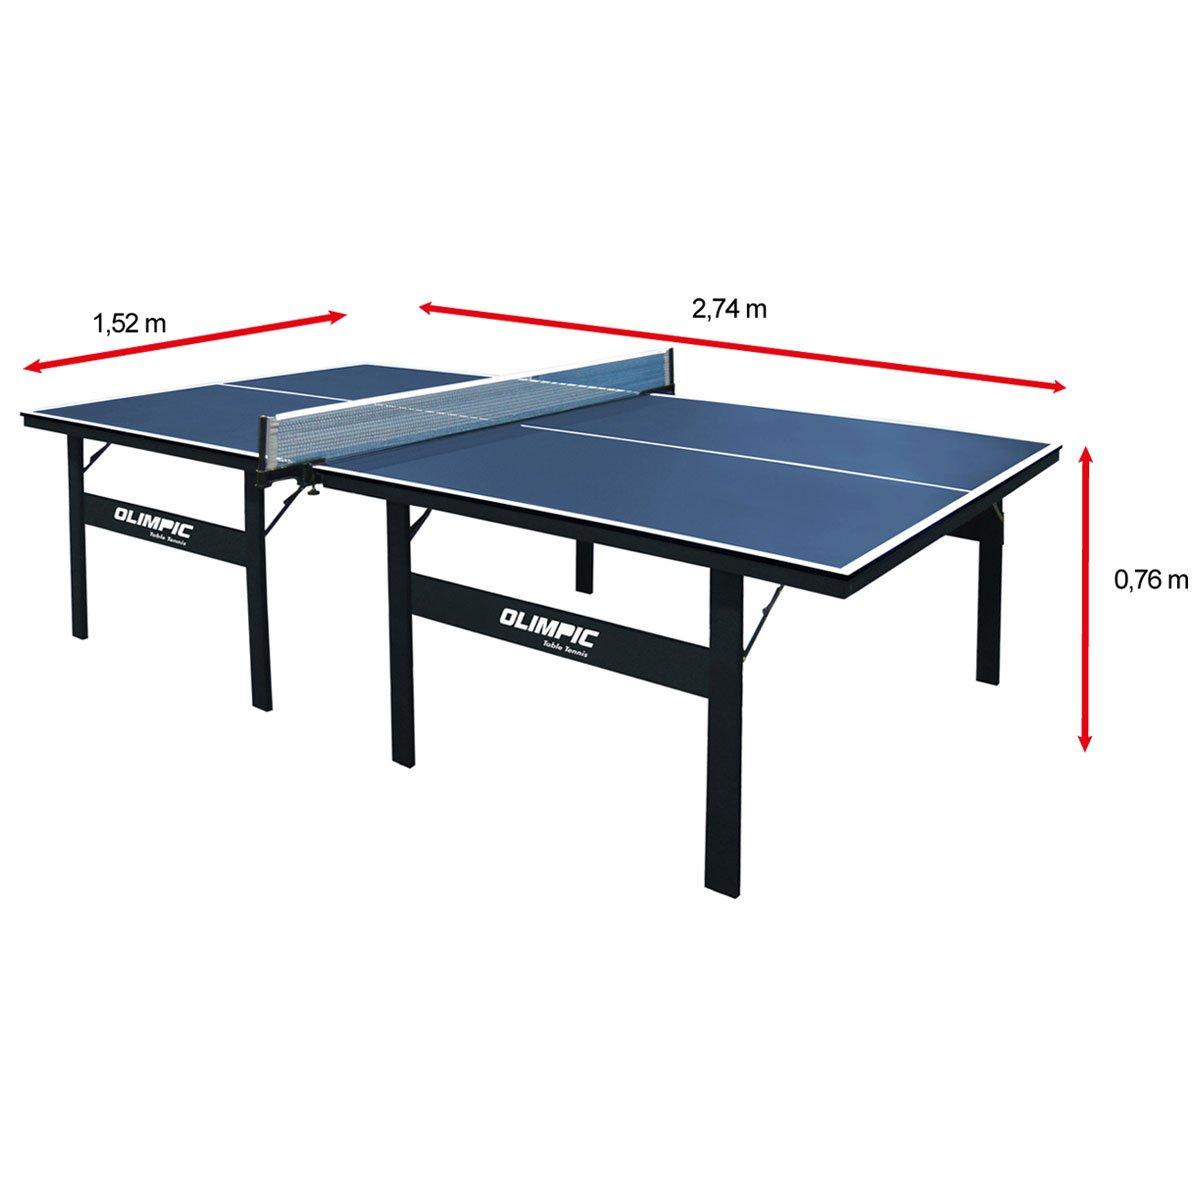 Mesa de ping pong t nis de mesa klopf olimpic 15 mm azul for Dimensiones mesa ping pong